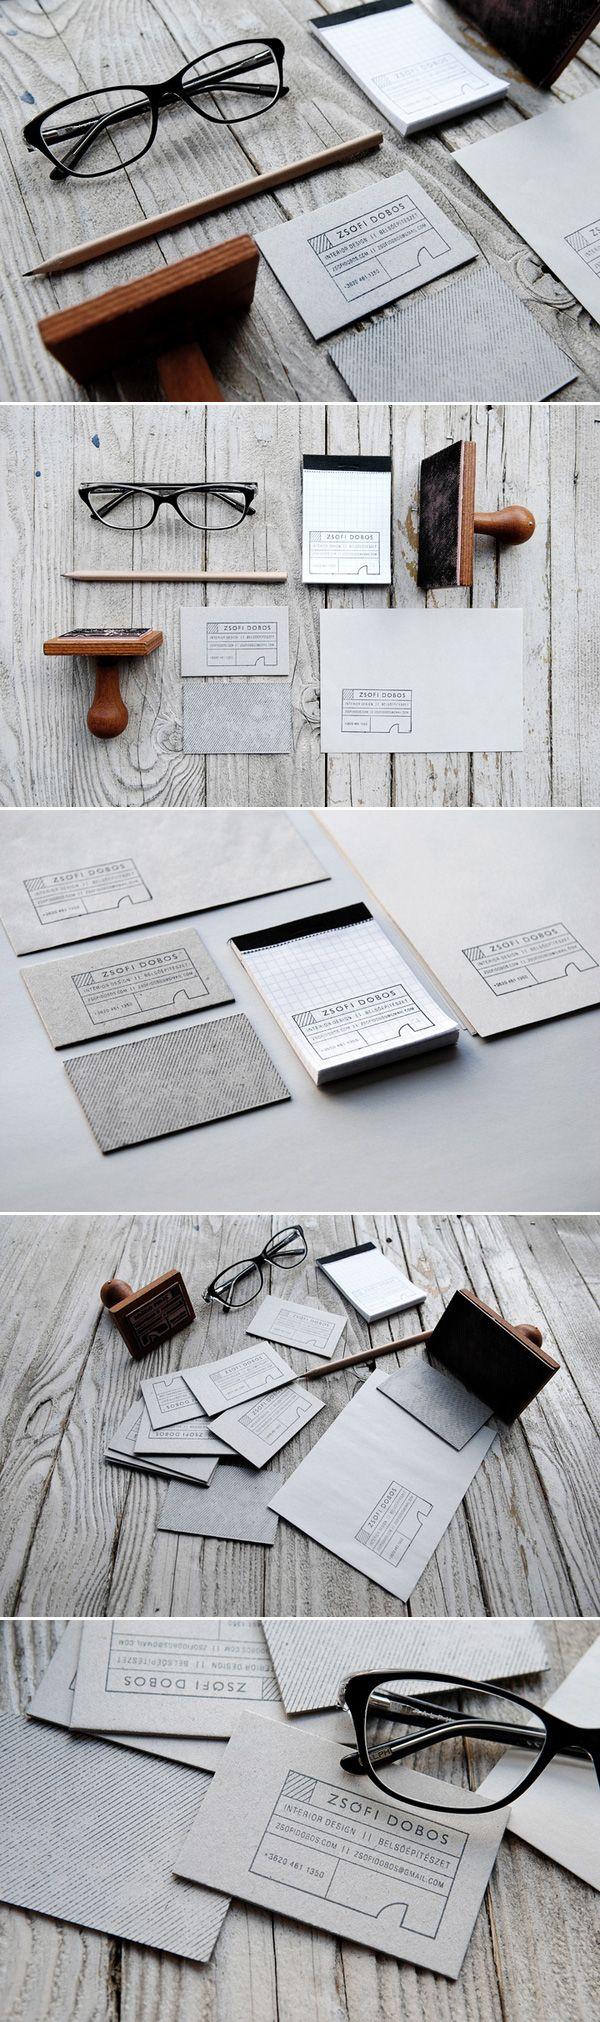 Unique Branding Design, Zsofi Dobos #branding #design (http://www.pinterest.com/aldenchong/)